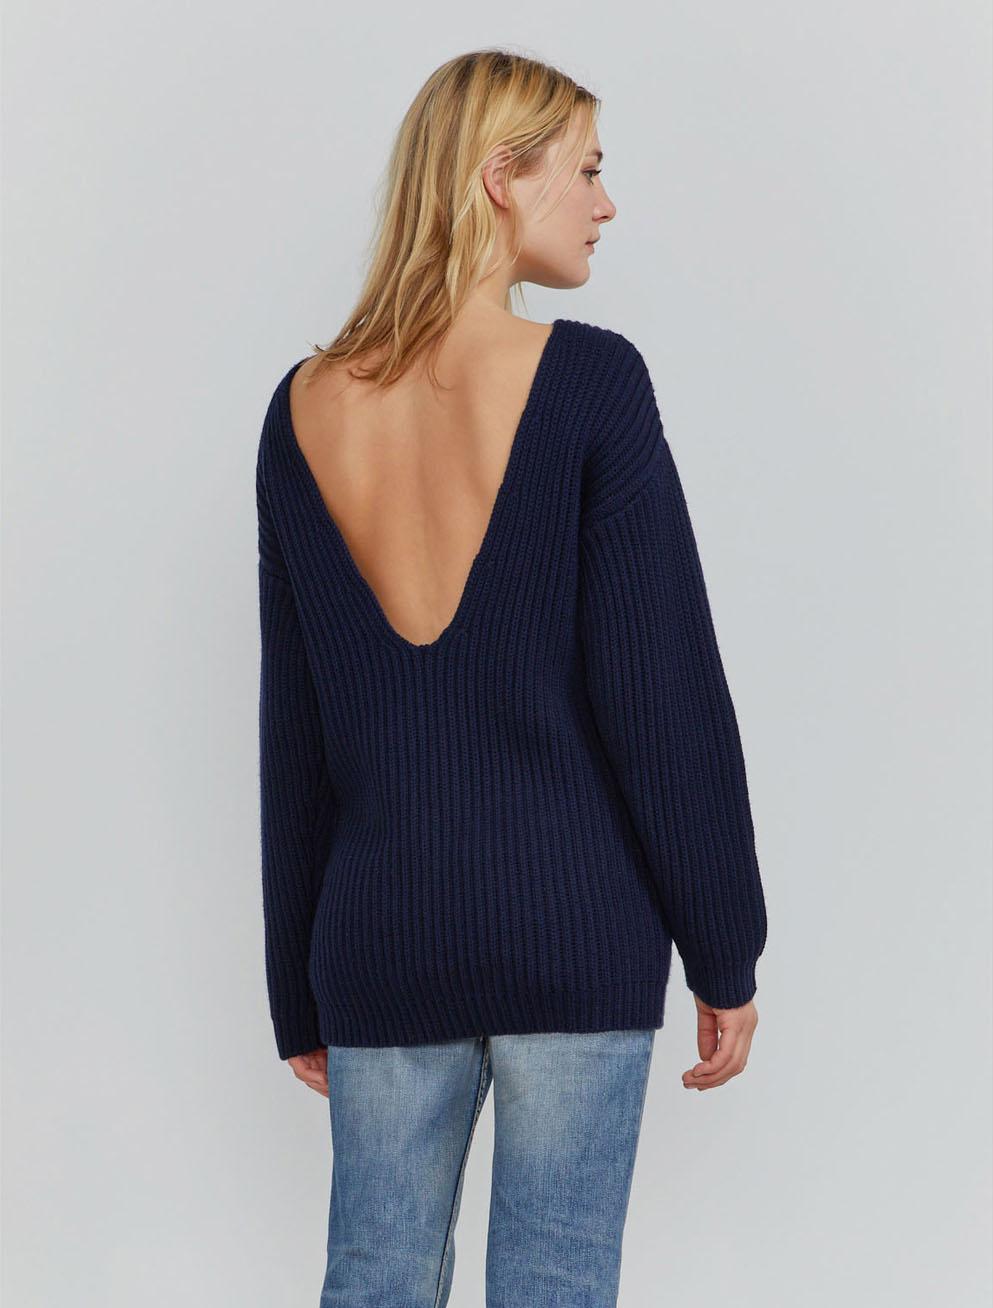 Organic merino fisherman's rib v-back sweater